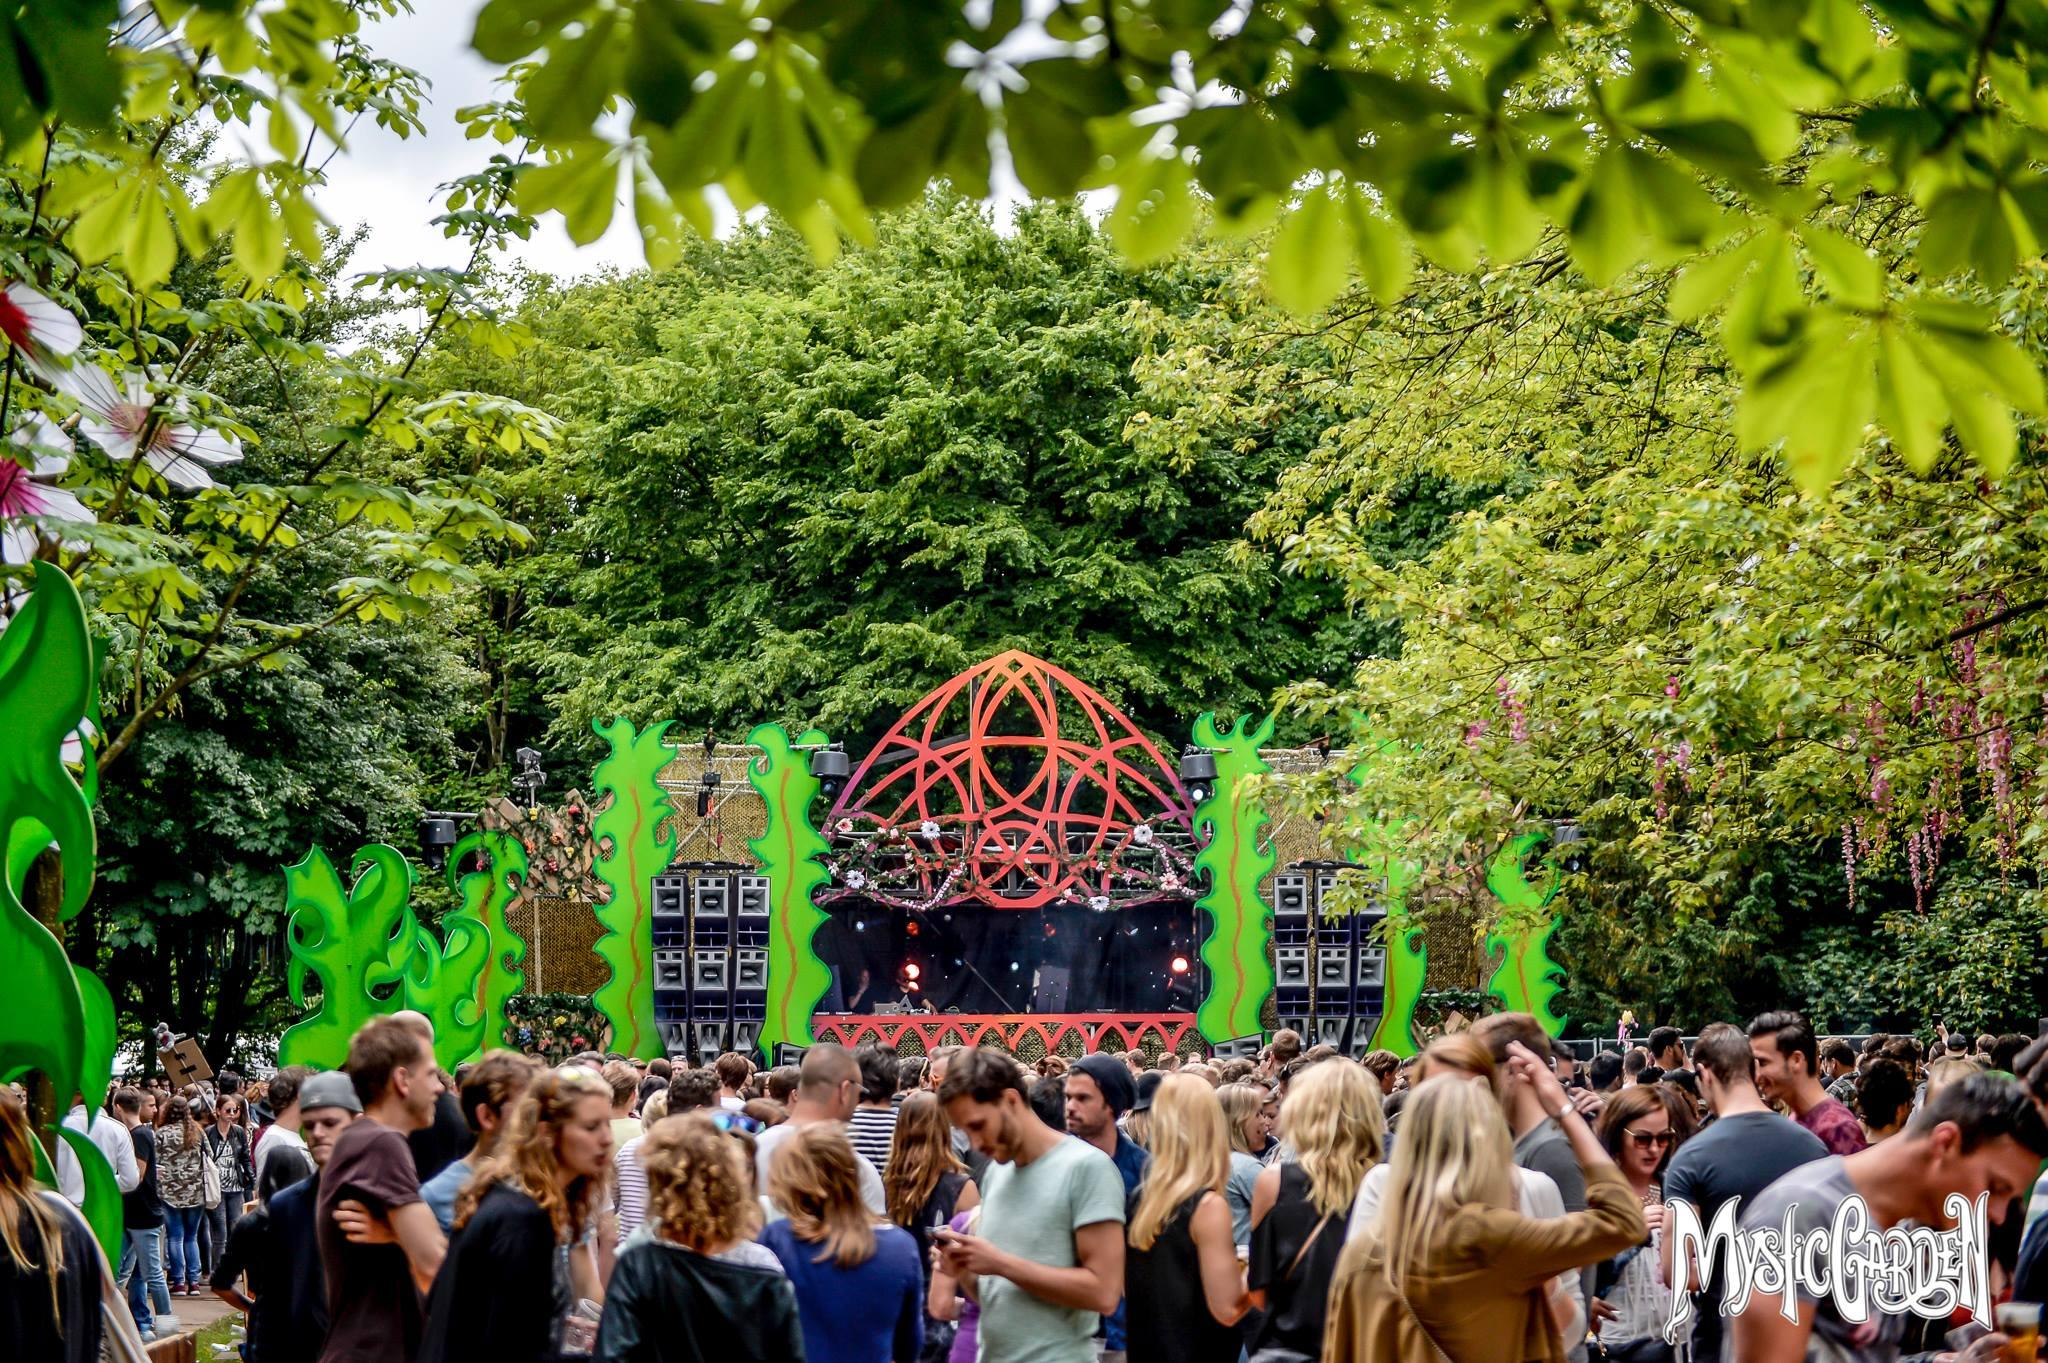 mystic-garden-festival-main-stage.jpg